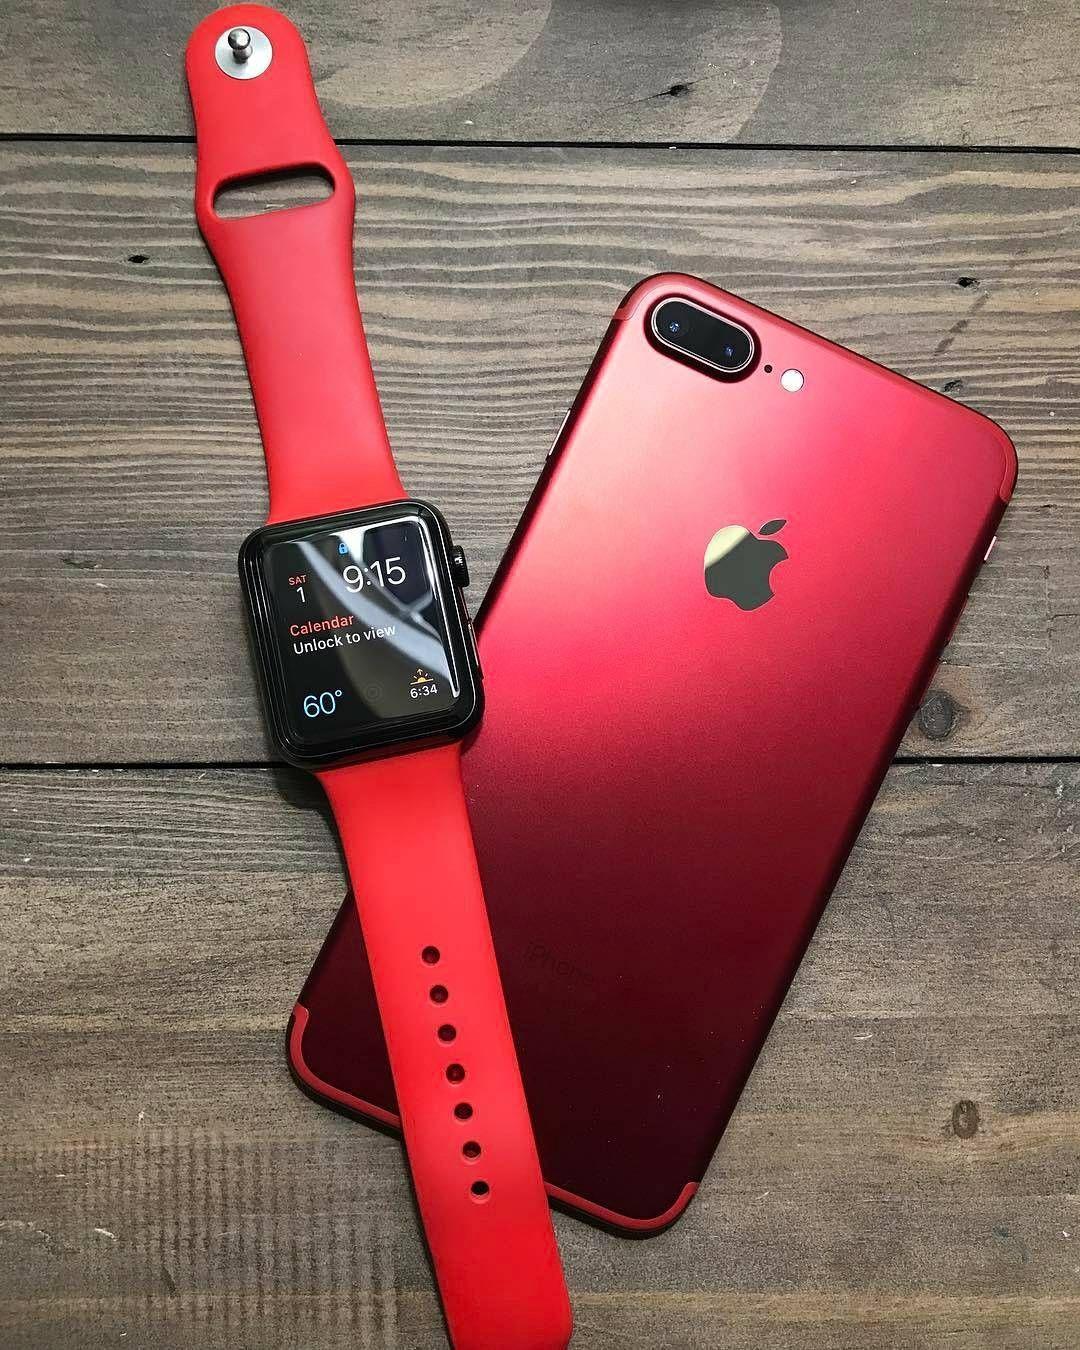 iPhone,Apple iPhone, iphone 8,iphone 9,iphone price ,apple ,ipad #iphone #ipad #appleiphone